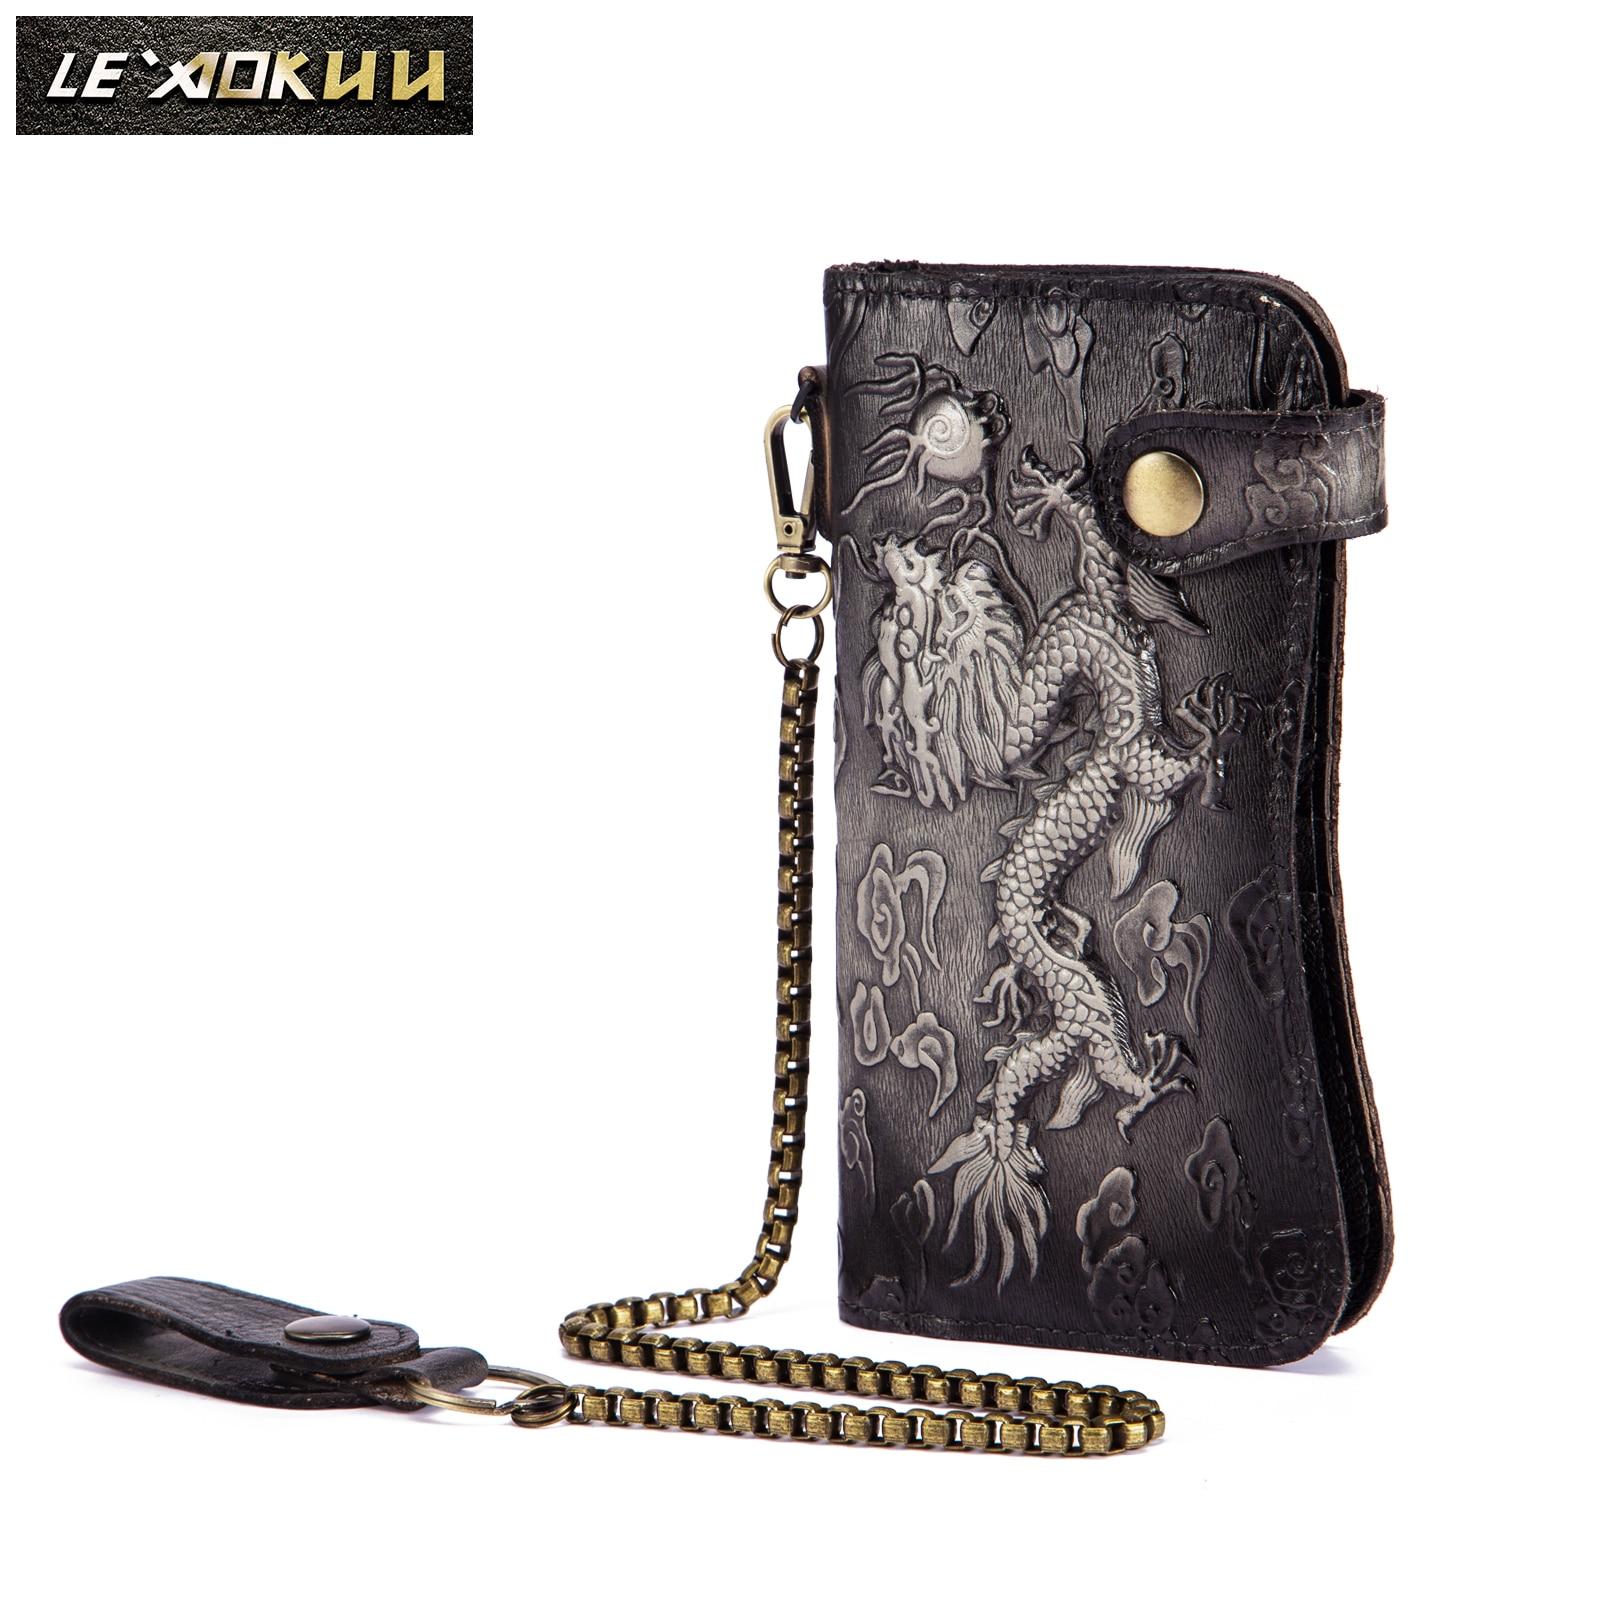 Cattle Male Organizal Real Leather Design Dargon Tiger Emboss Checkbook Iron Chain Wallet Purse Clutch Handbag 1088